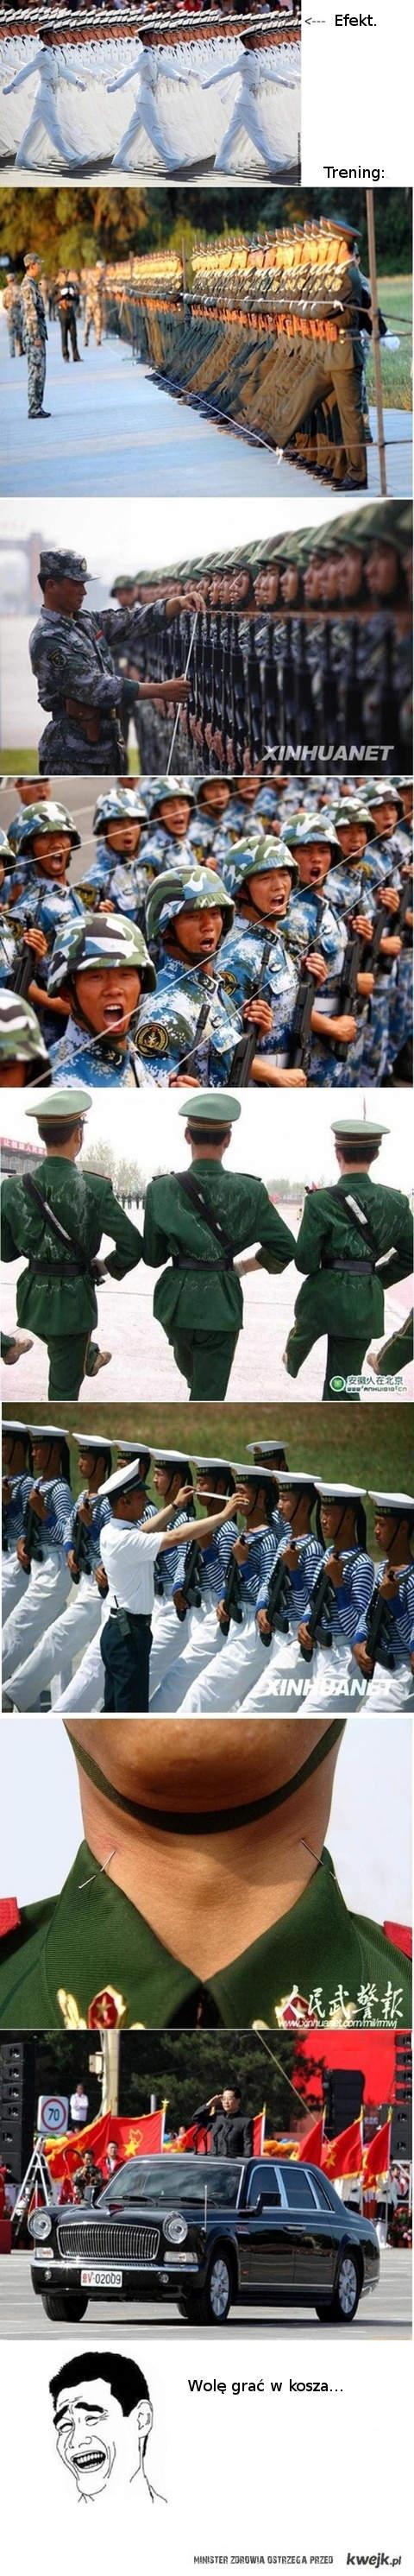 chińska musztra